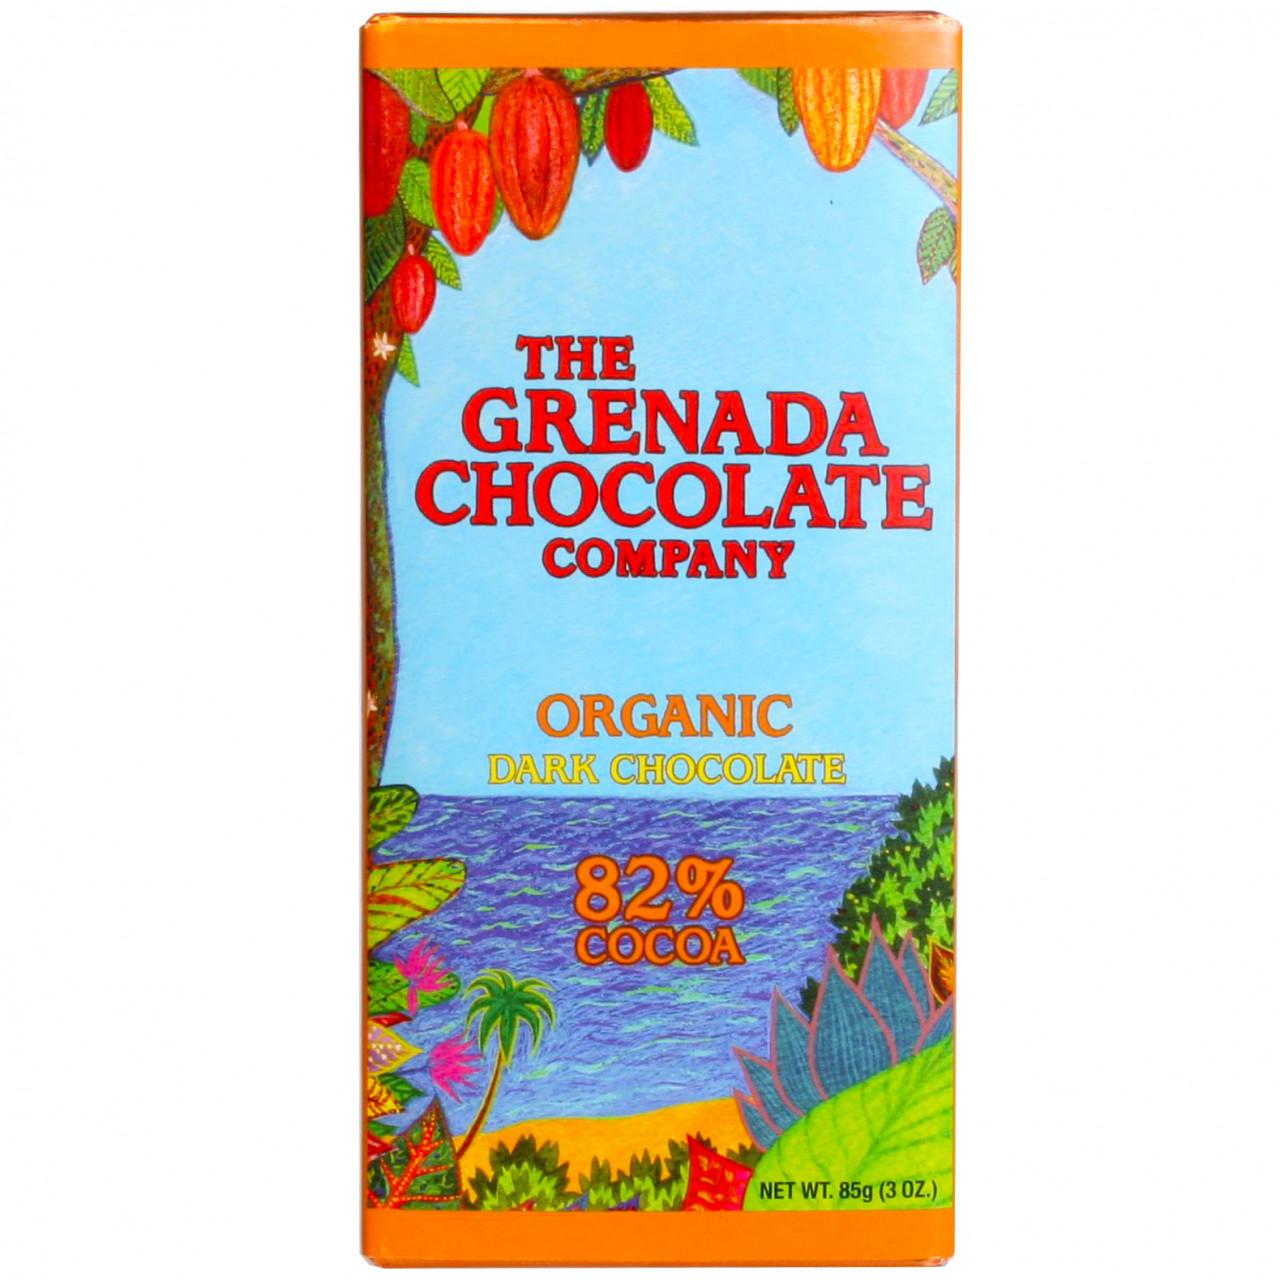 Grenada Chocolate, Bio Schokolade, Organic Chocolate, Dunkle Schokolade, Edelbitterschokolade, Schokolade von Grenada, Nussfreie Schokolade, Organic Chocolate, dark chocolate, chocolat noir, Grenada C - Bar of Chocolate, nut free chocolate, Grenada, Grenadian chocolate - Chocolats-De-Luxe